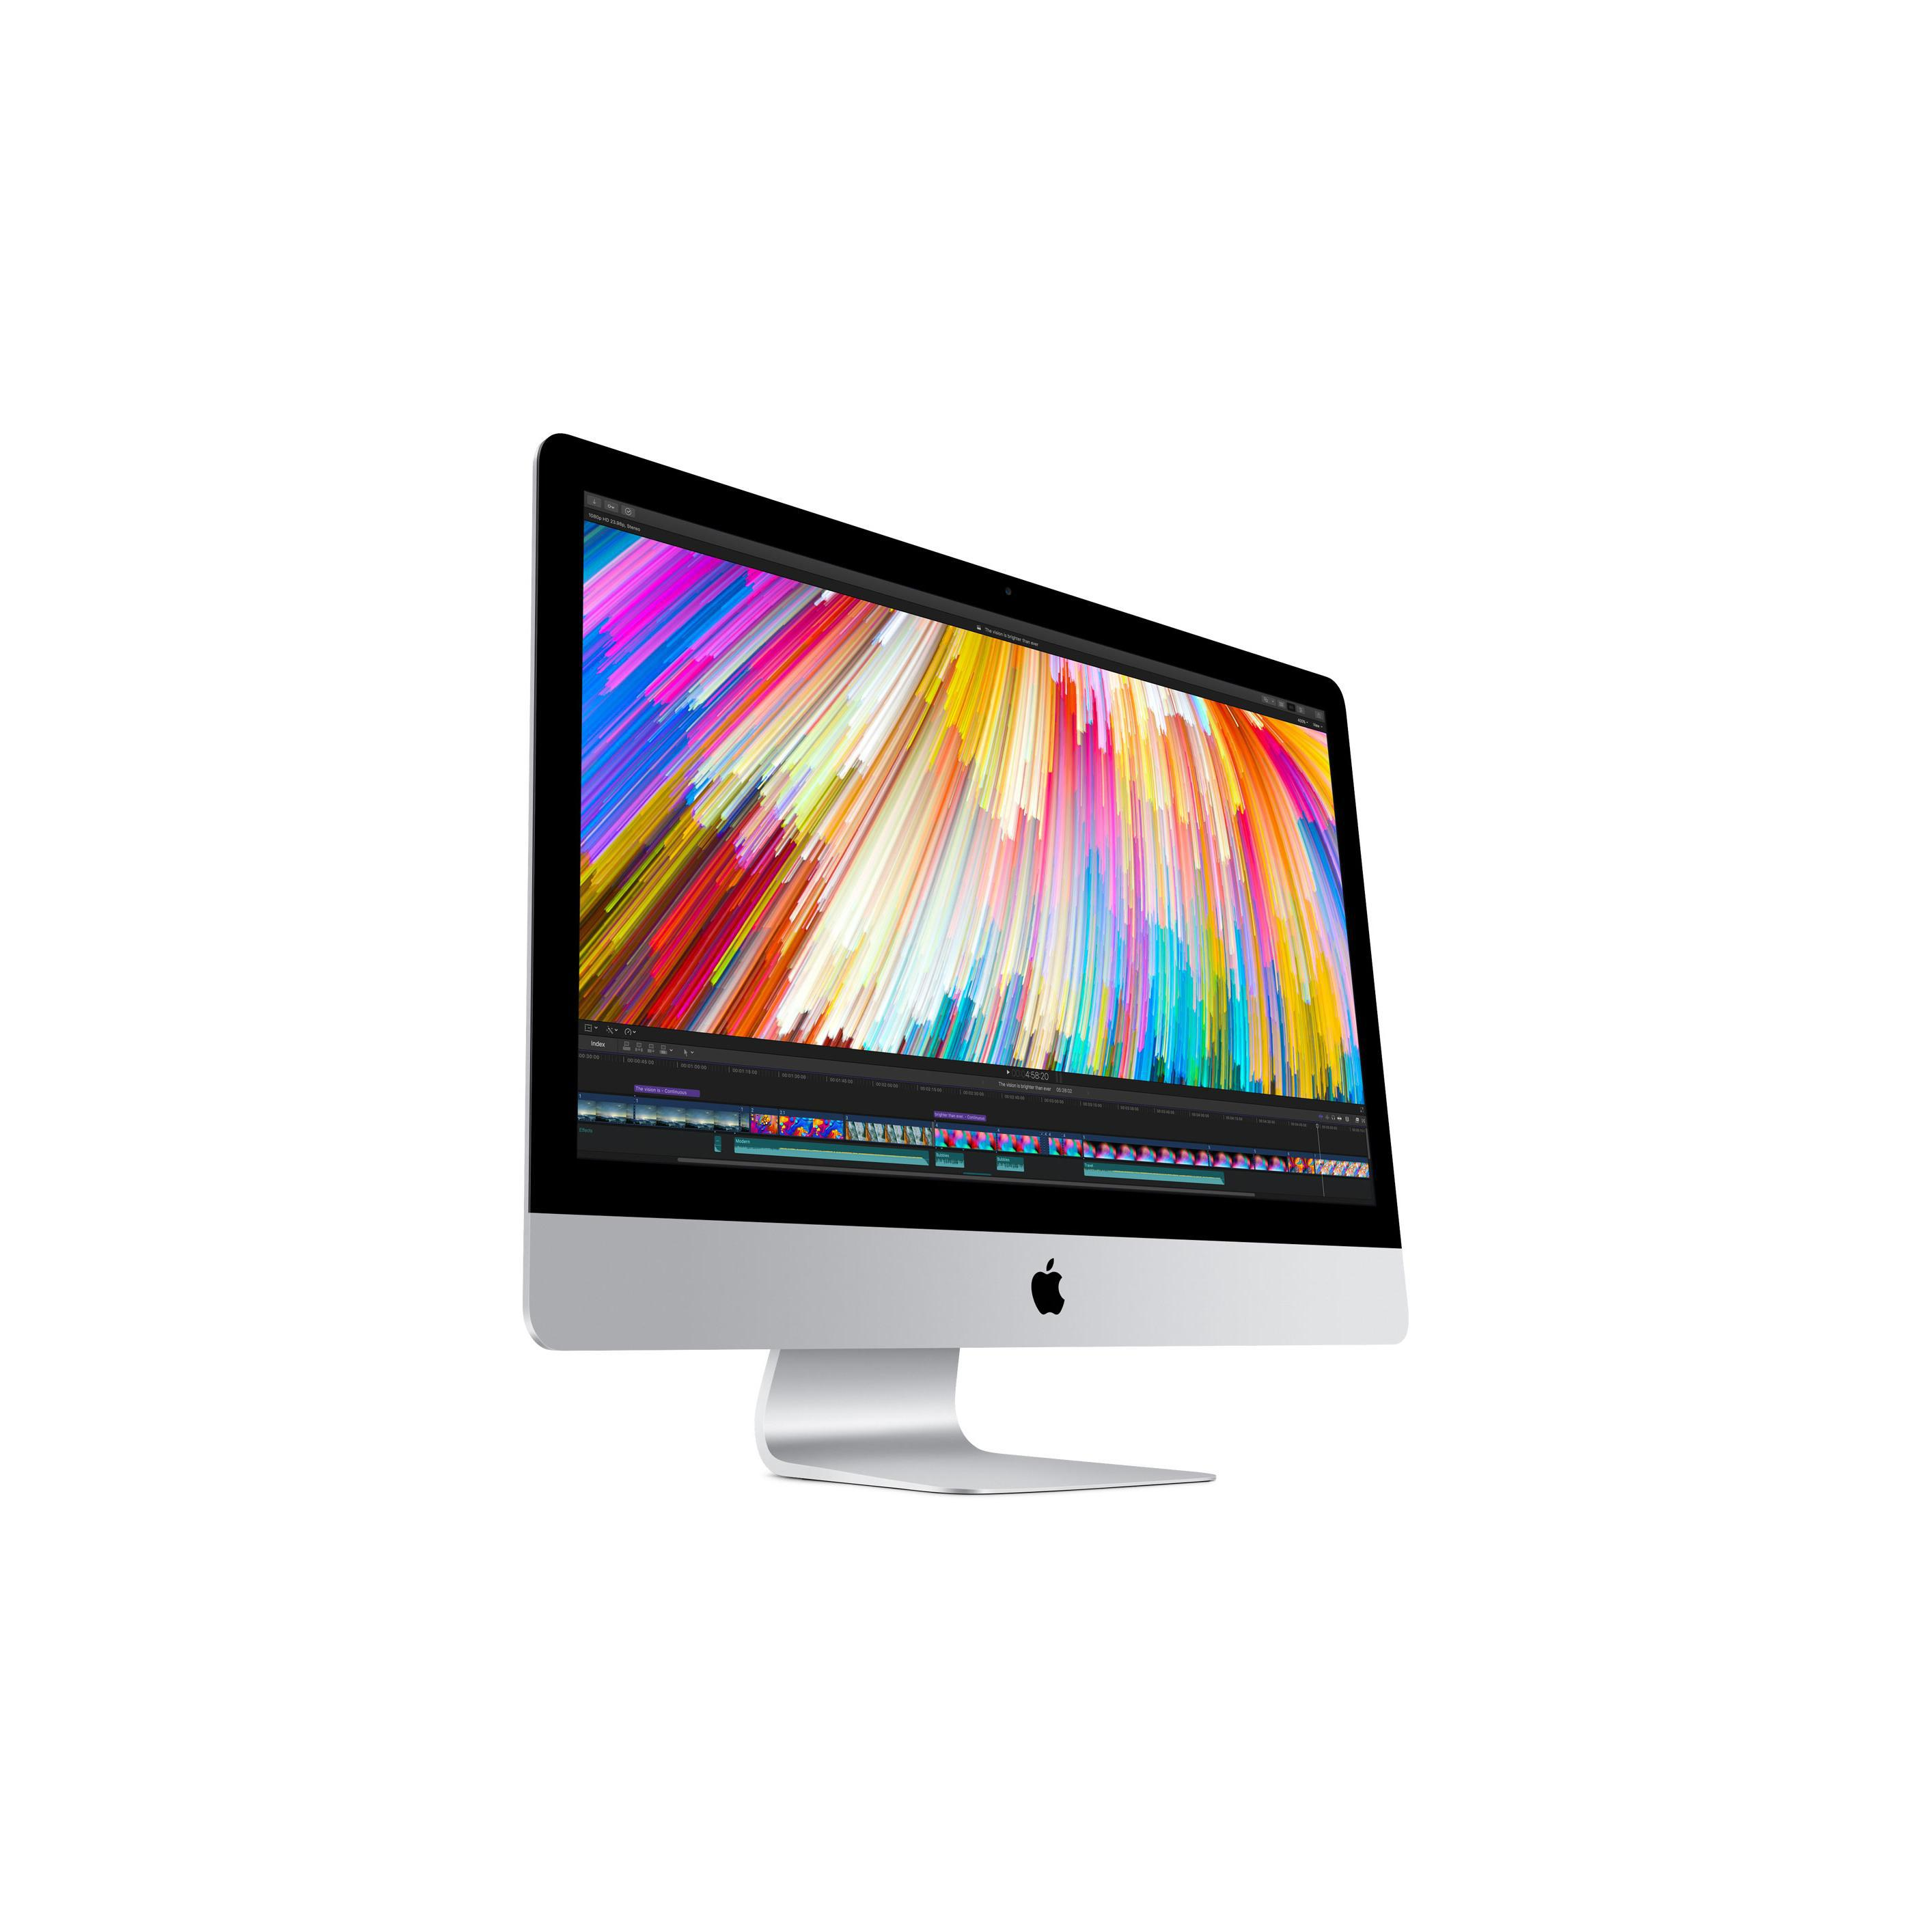 iMac 27-inch Retina (Mid-2017) Core i5 3.4GHz - HDD 1 TB - 8GB